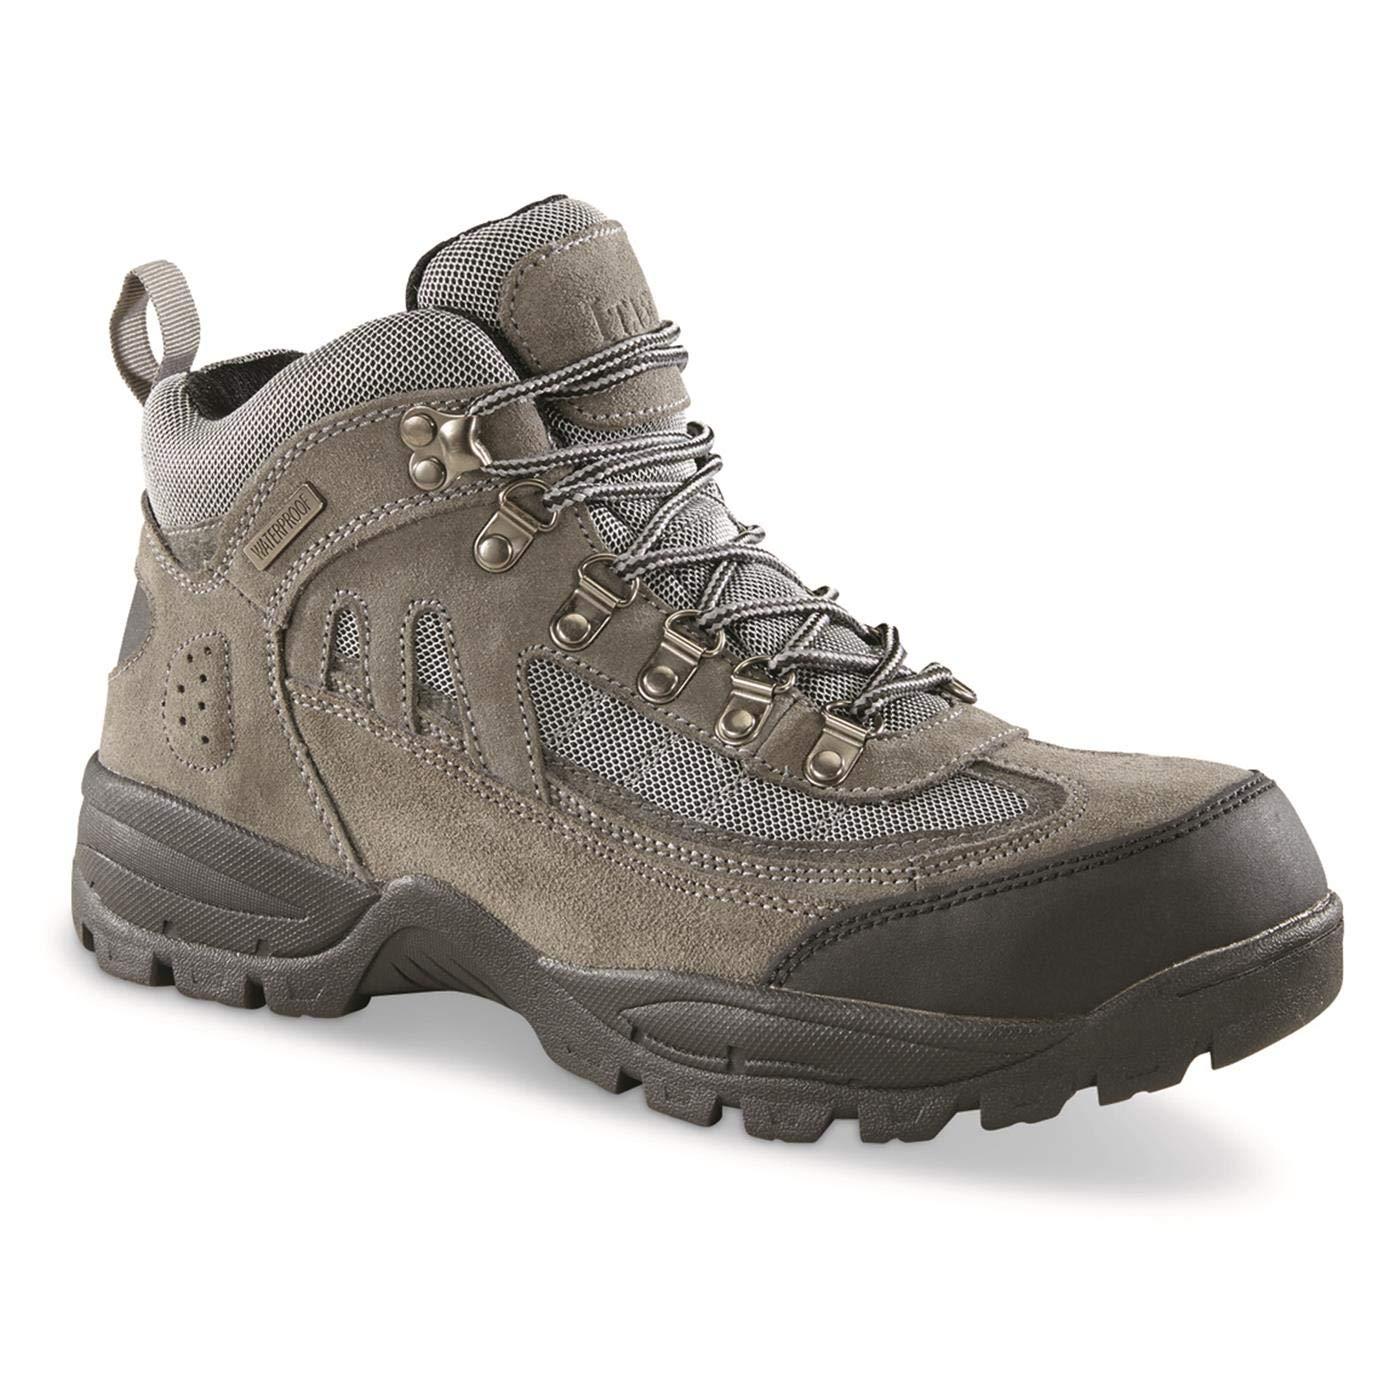 532a83d79f0 Itasca Men's Waterproof Amazon Hiker Hiking Boot